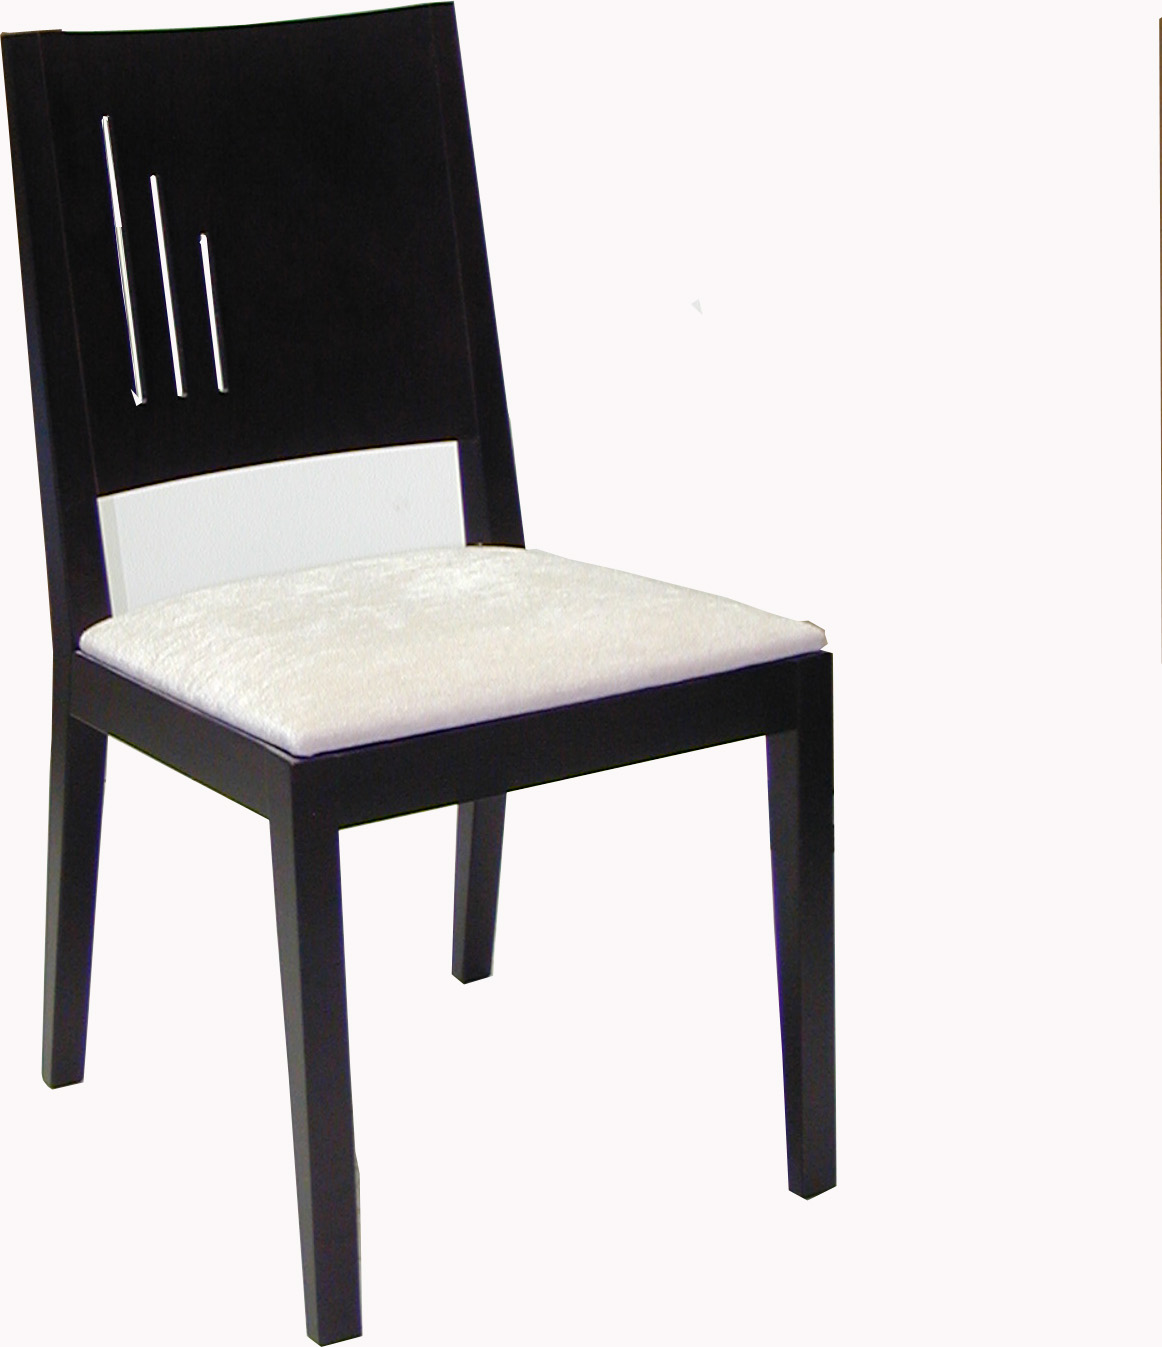 Silla madera salon comedor maciza catrina tapizada for Sillas salon comedor